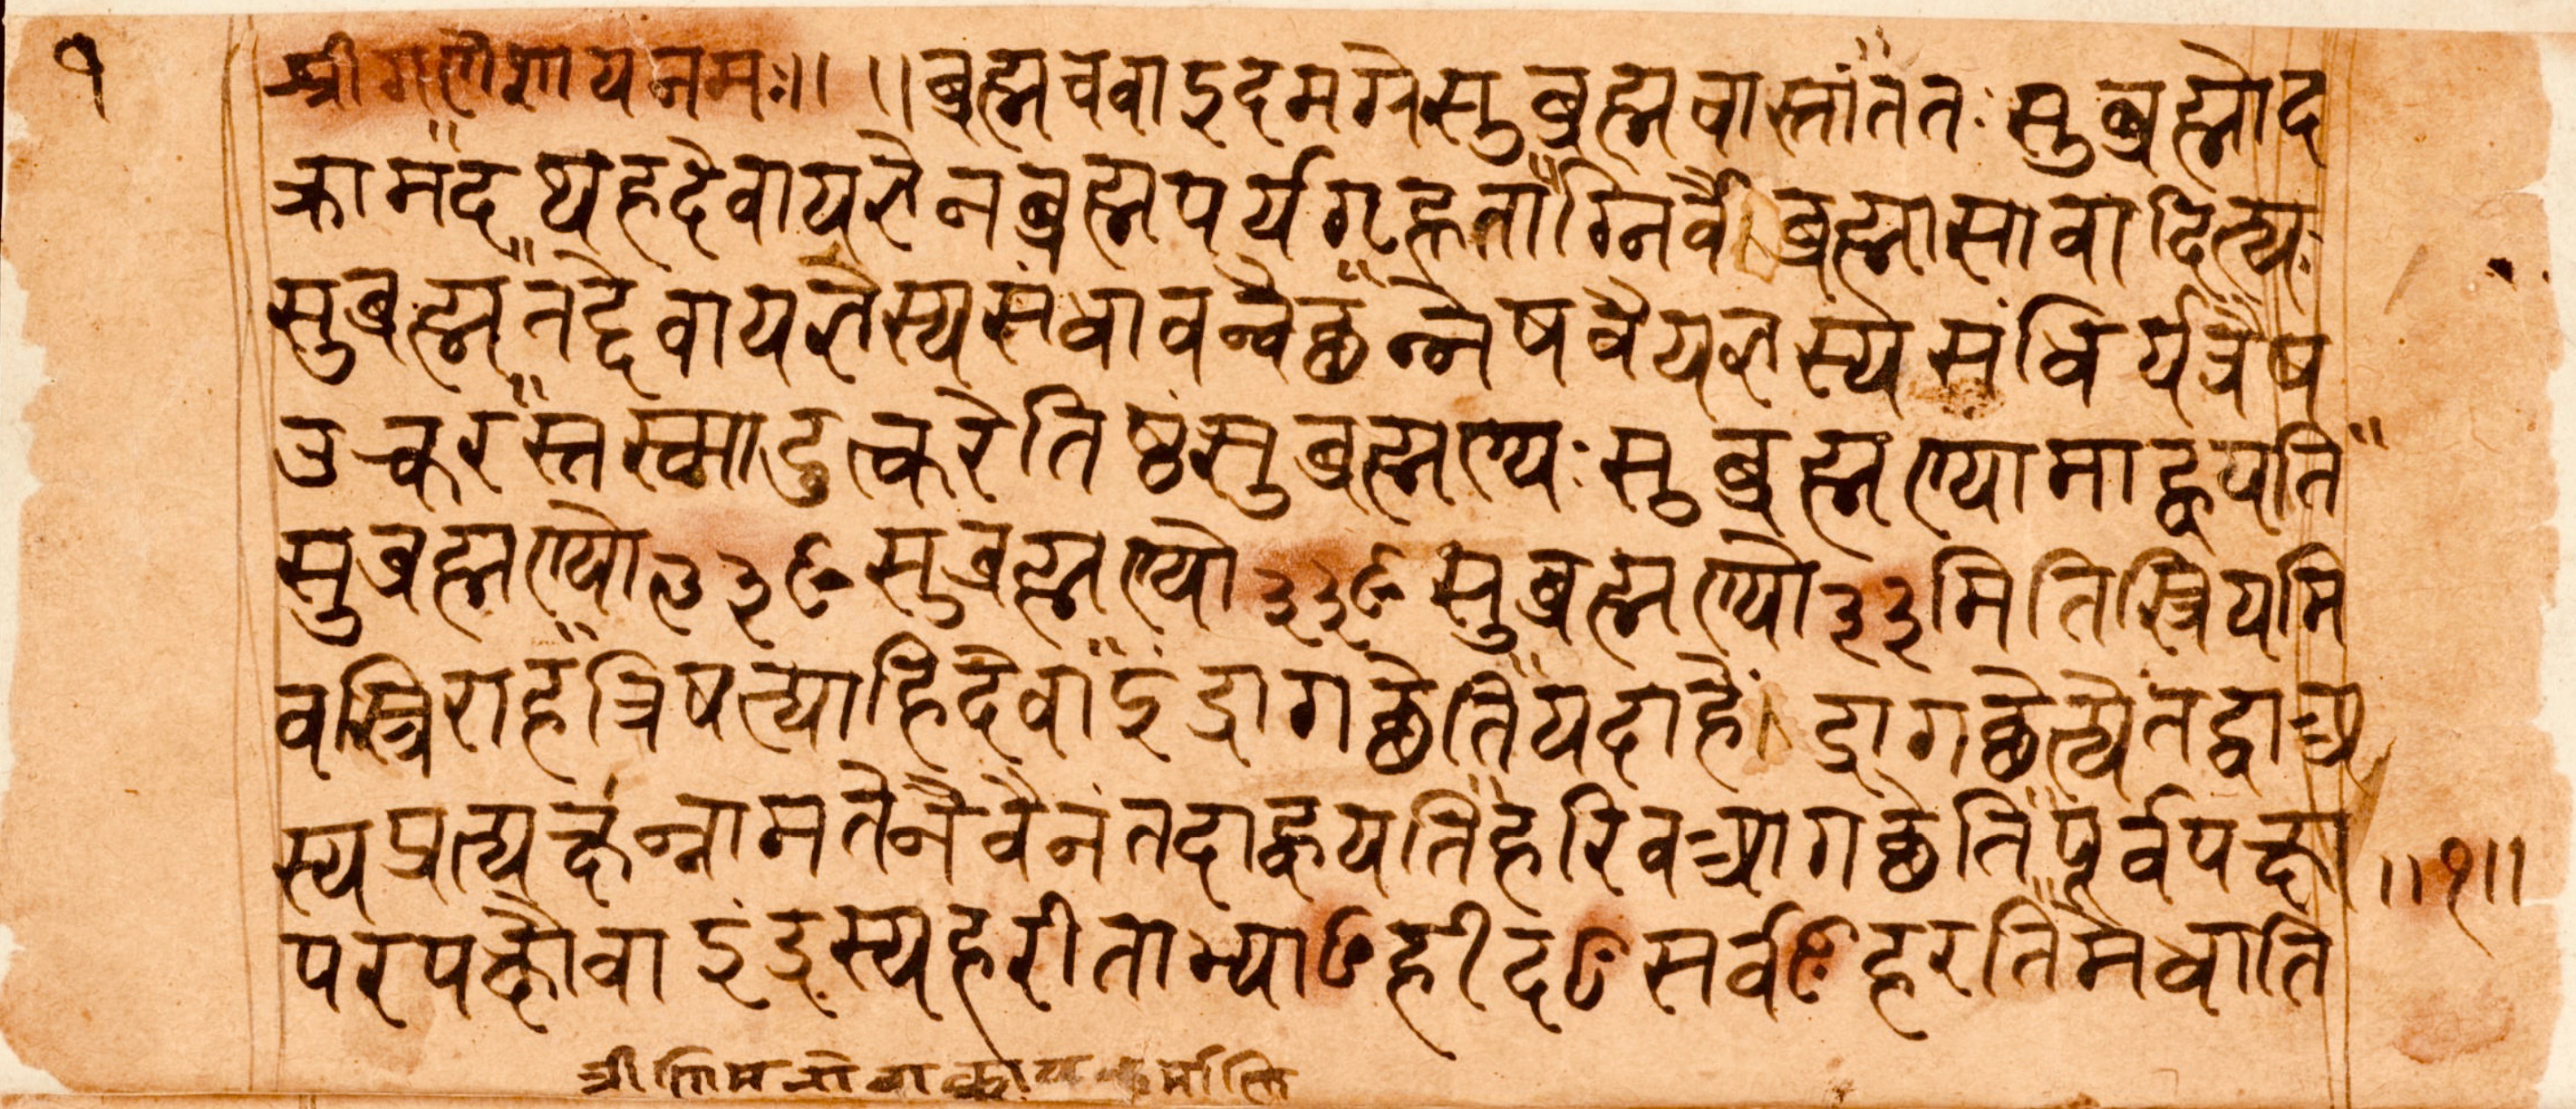 Brahmana - Wikipedia